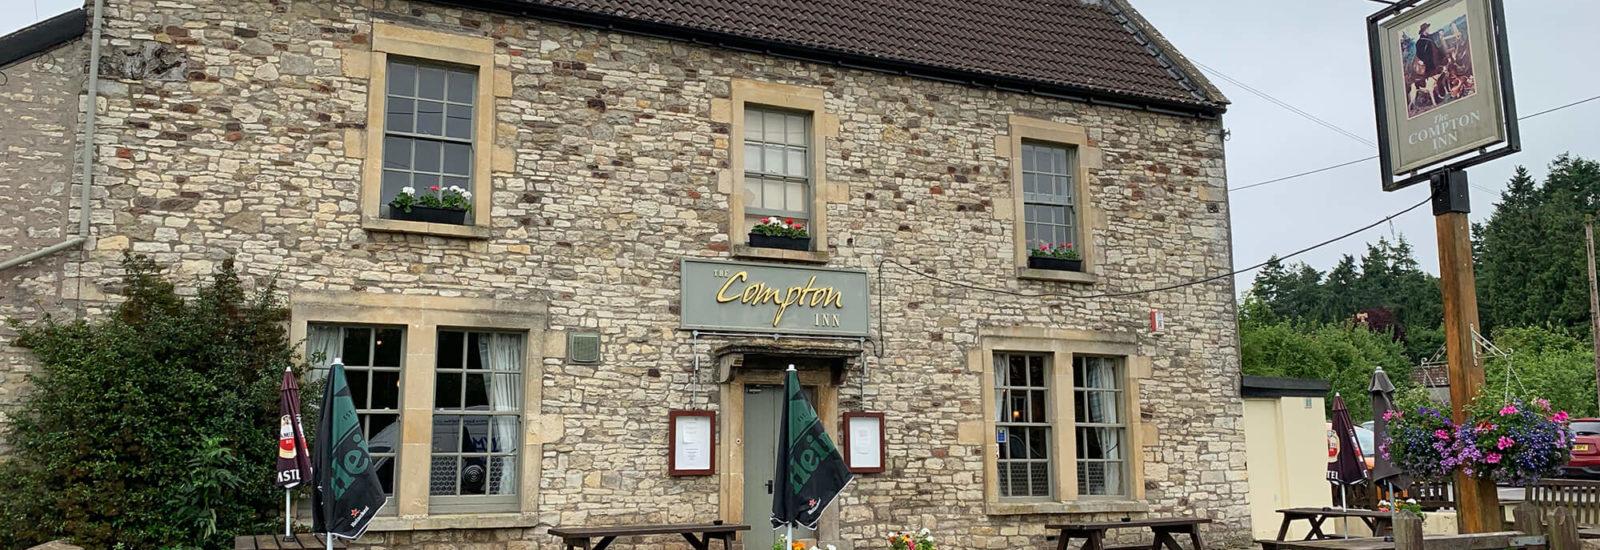 Image of The Compton Inn